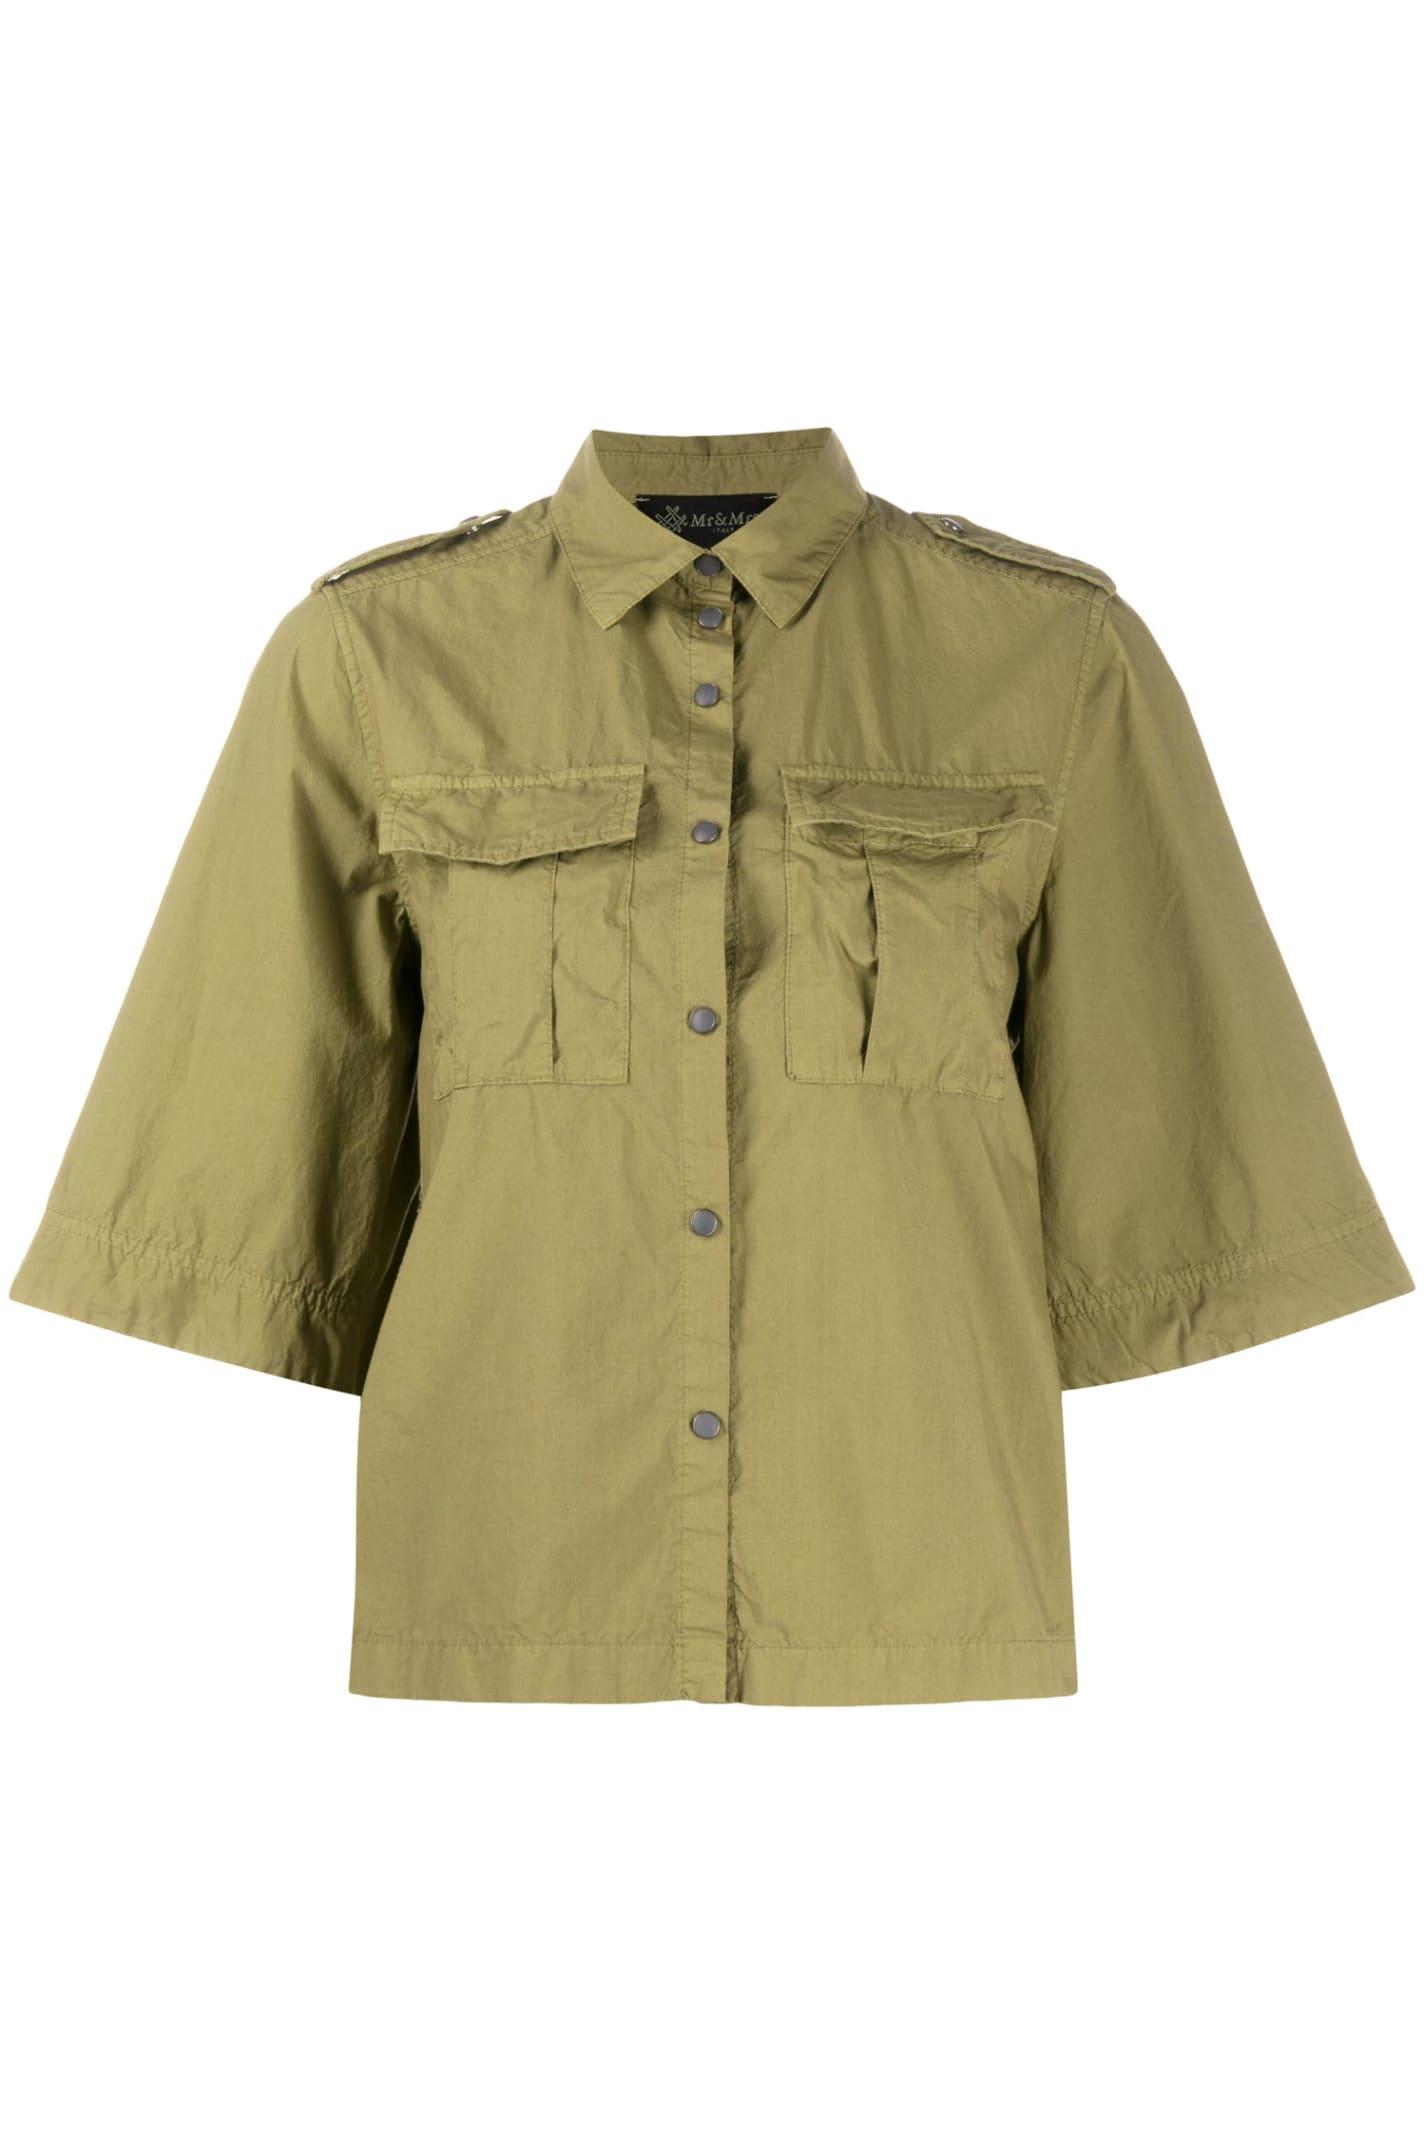 Mr & Mrs Italy Light Cotton Popeline Shirt For Woman